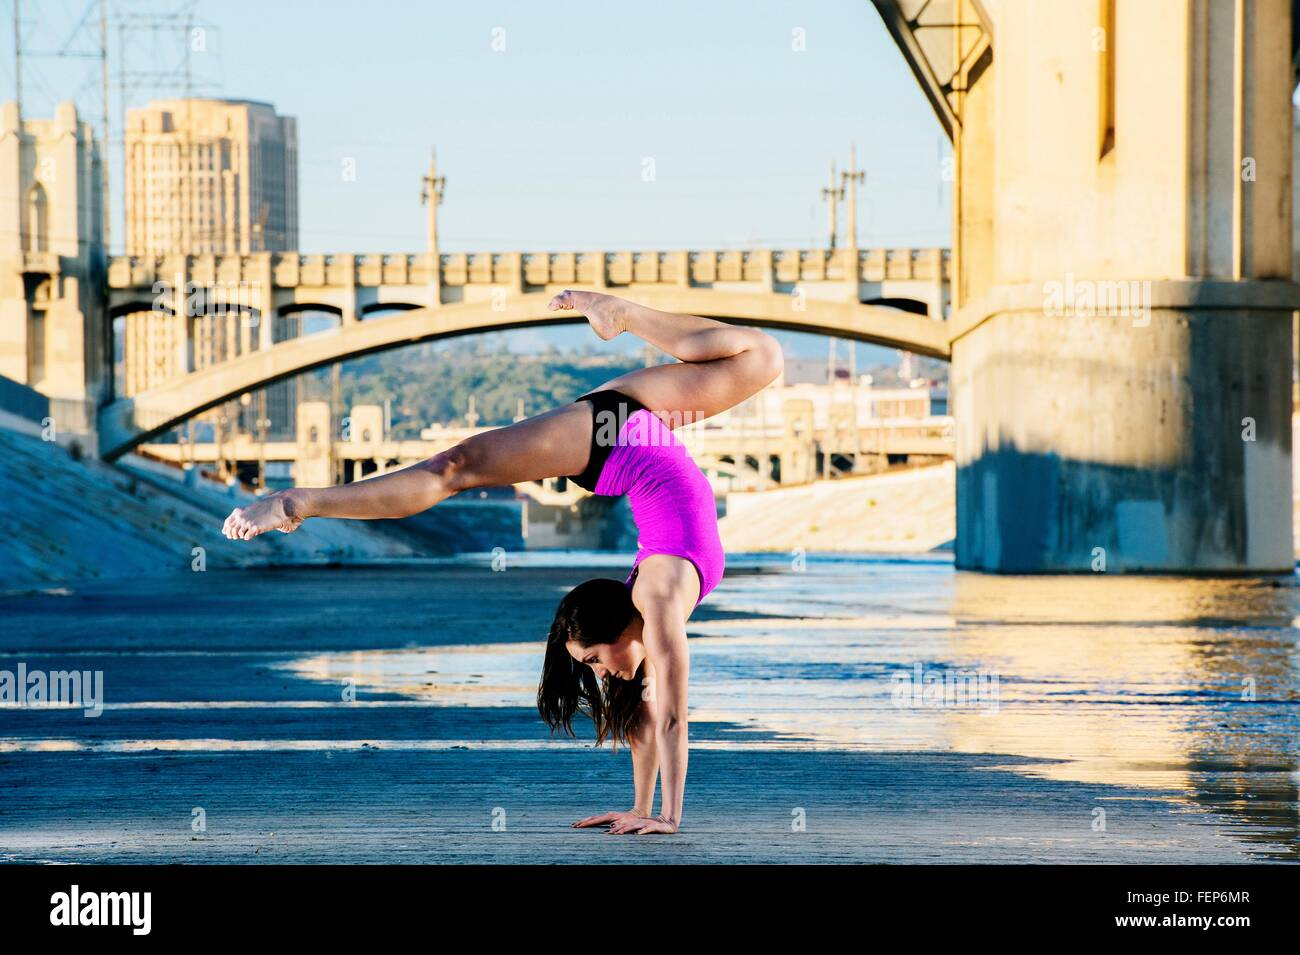 Vue latérale du dancer doing handstand, jambes ouvertes, Los Angeles, Californie, USA Photo Stock